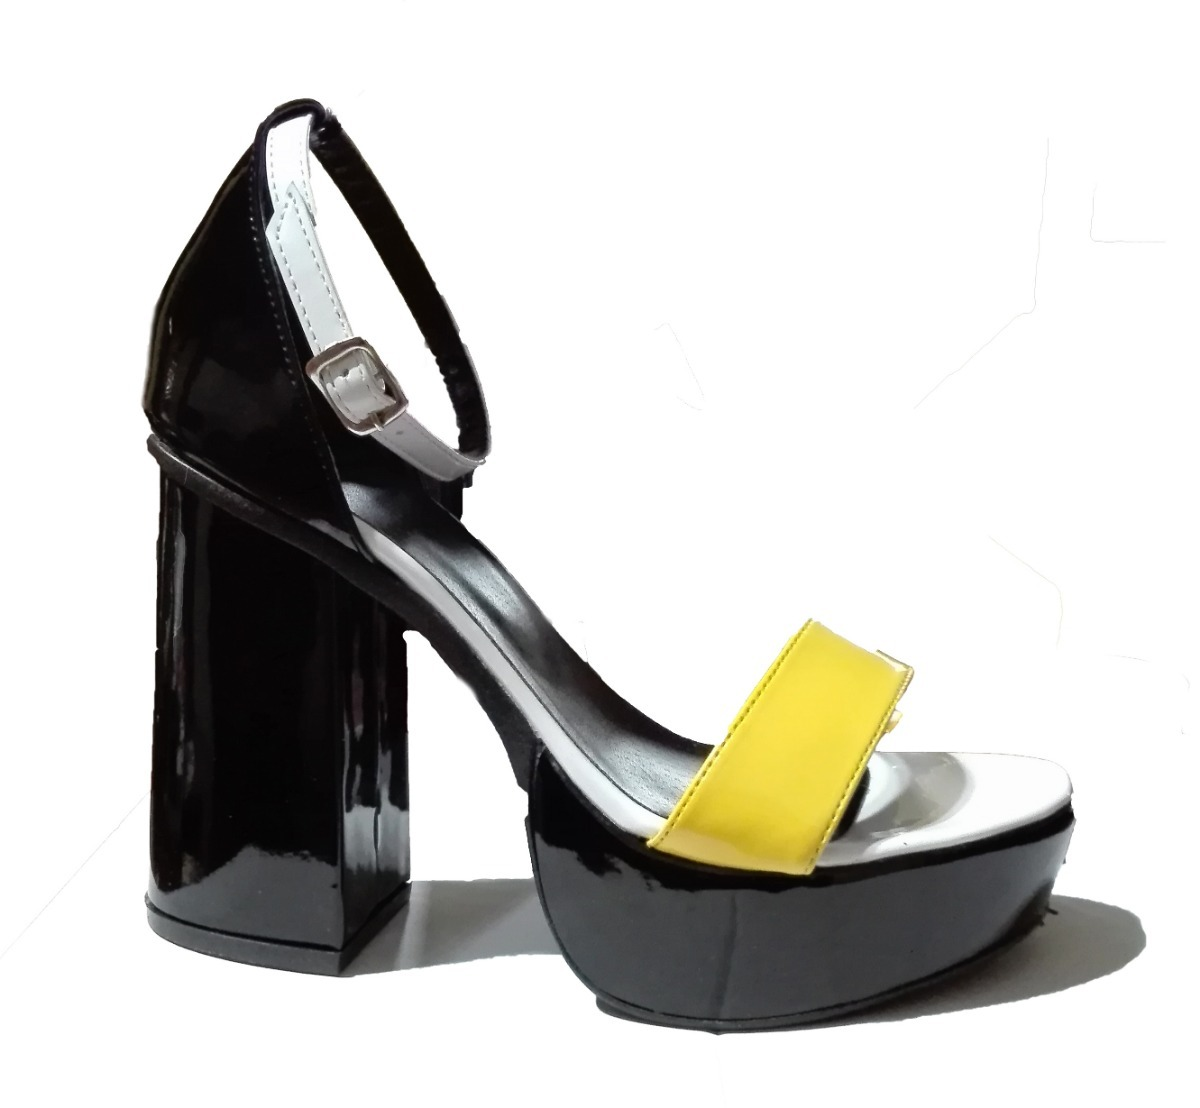 Sandalias Plataforma Mujer 2019 Charol Altas Zapatos Fiestas qqTXr 335d422a2428